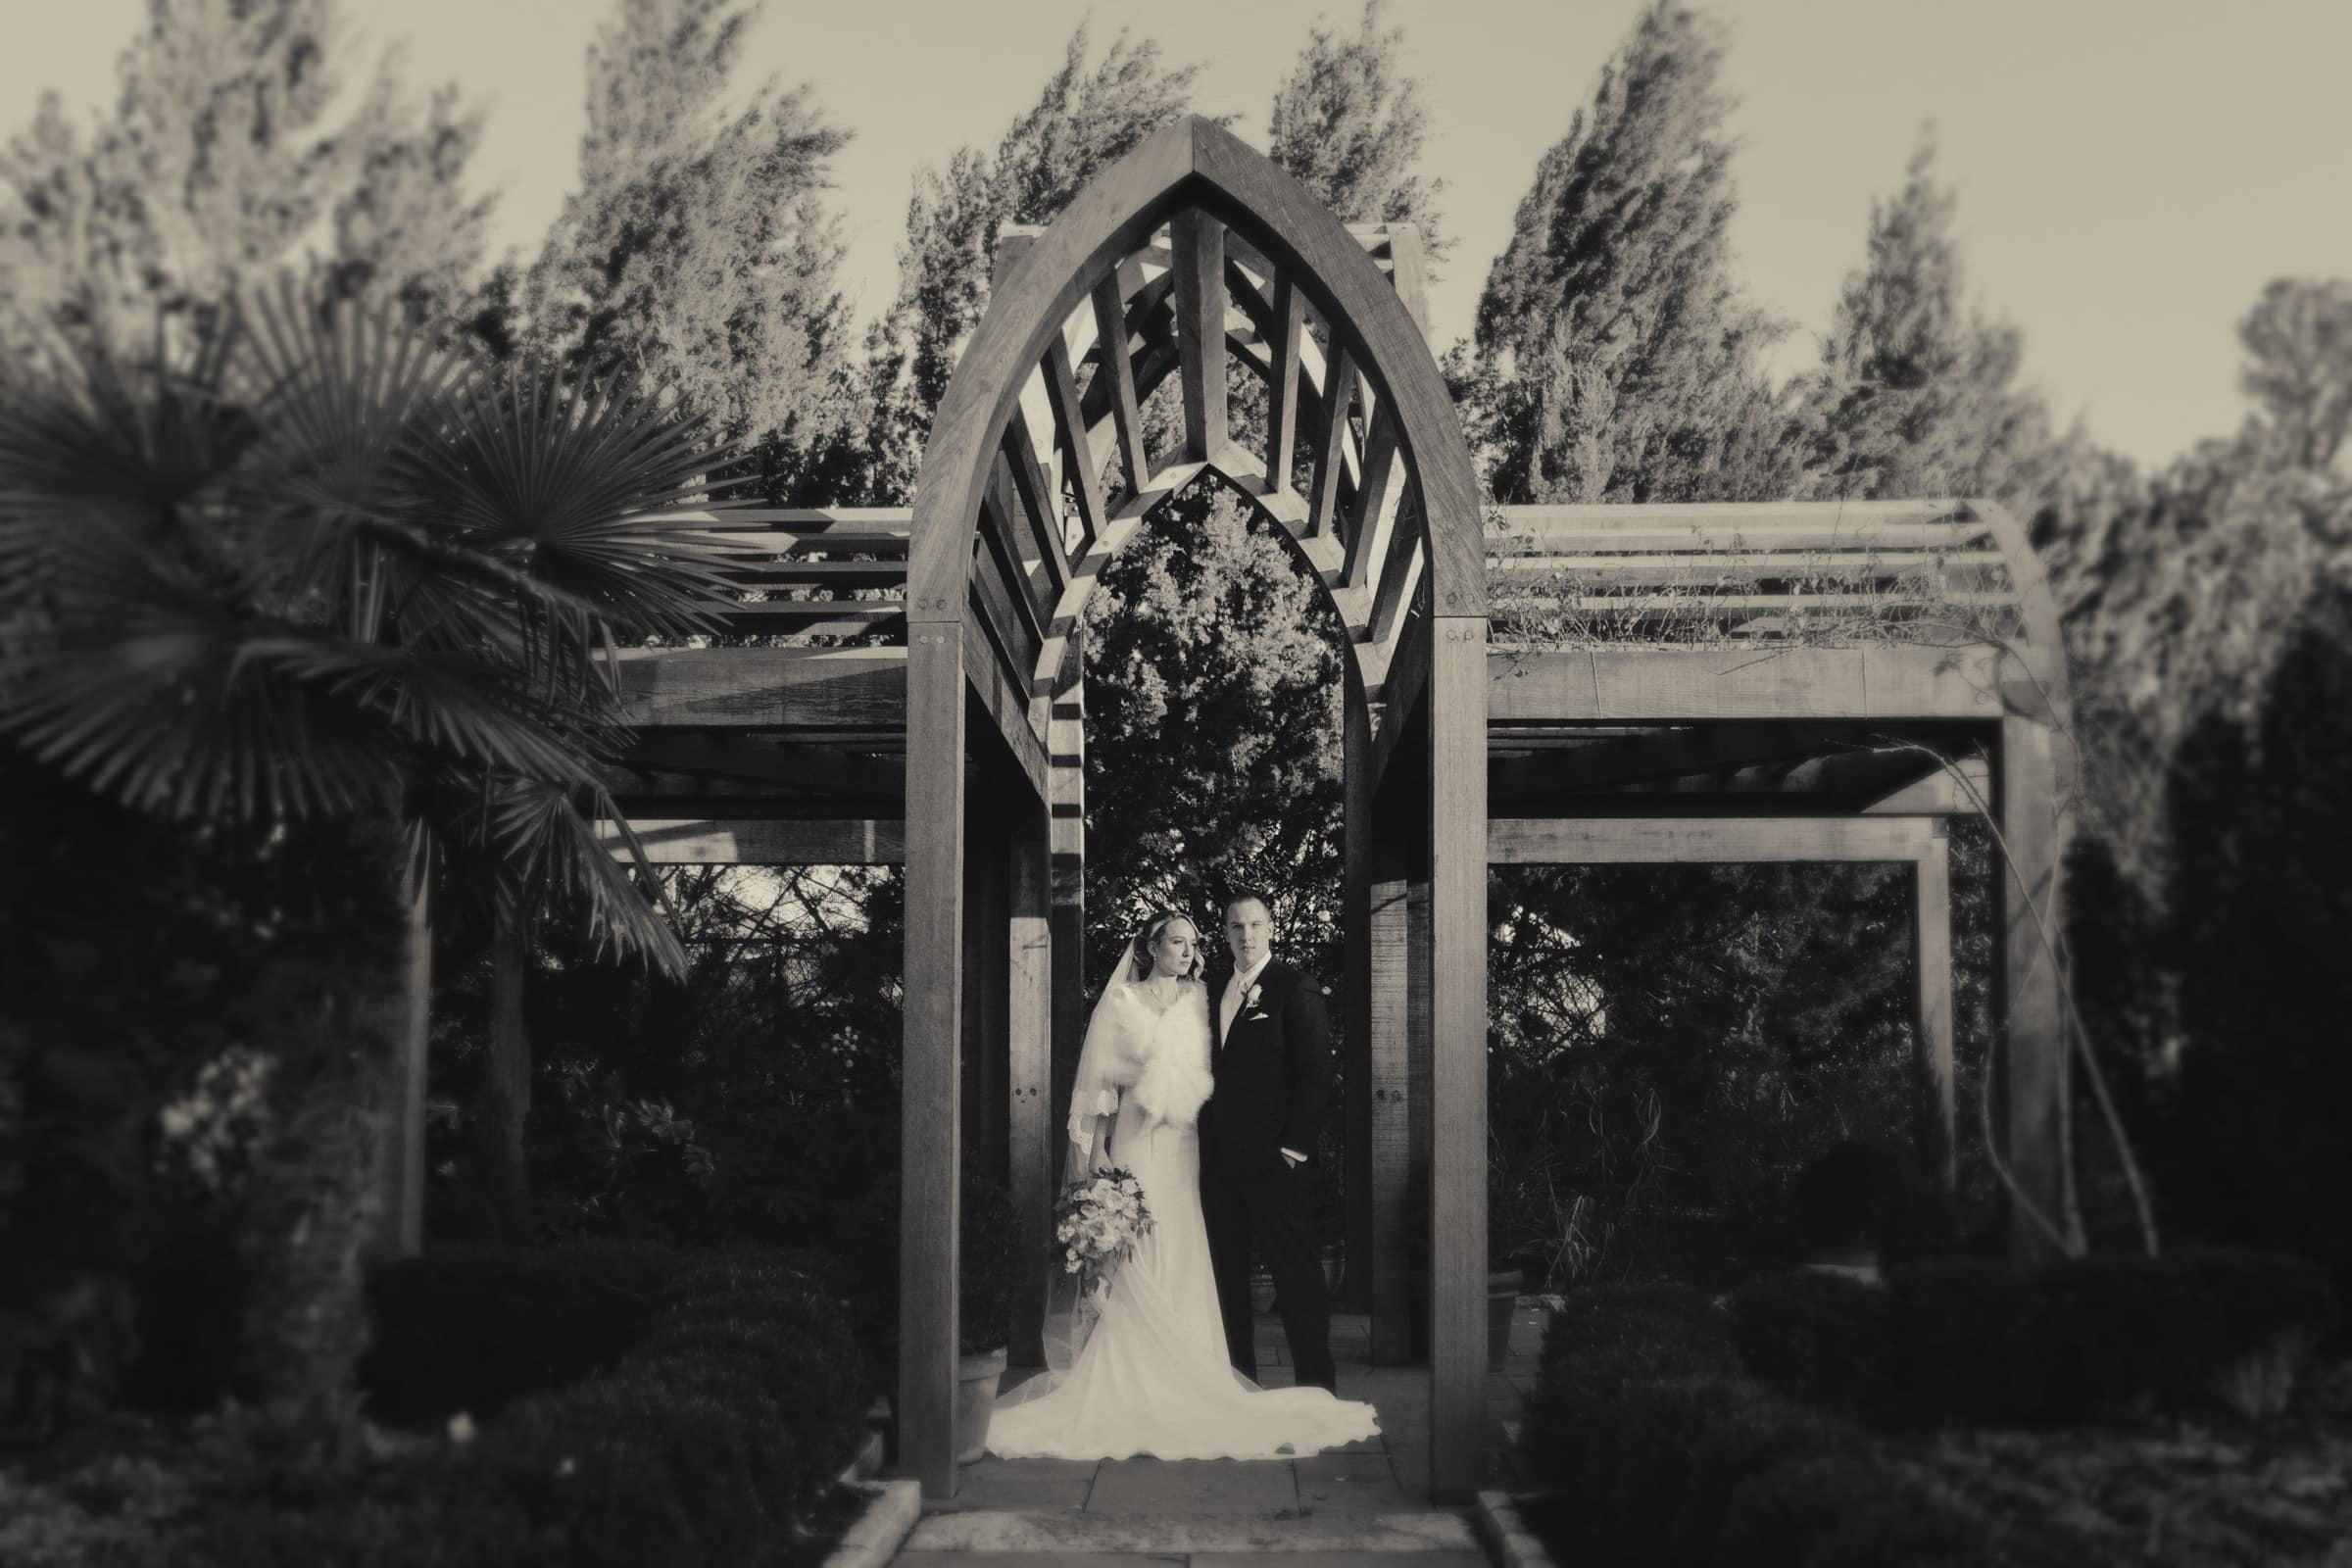 Duke Chapel Wedding Photography - First Look Photo at Duke Gardens B&W